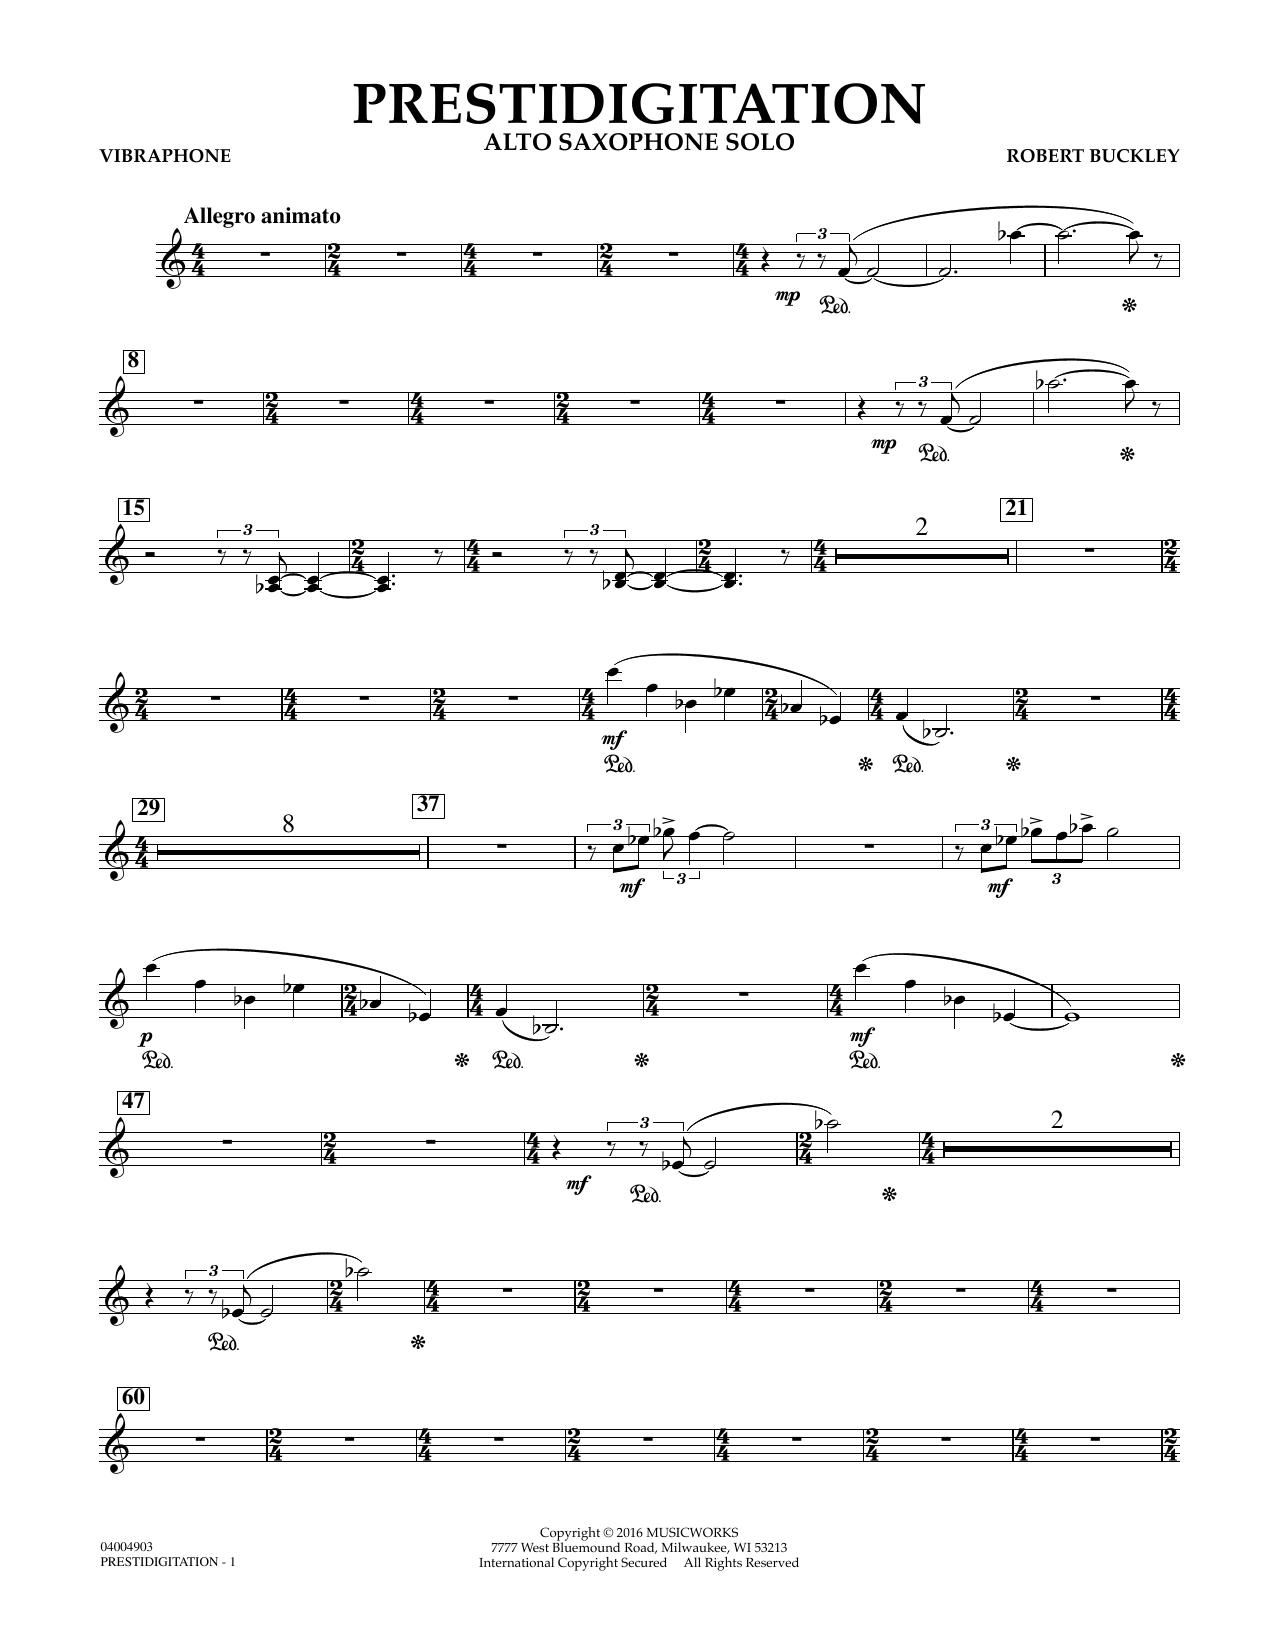 Prestidigitation (Alto Saxophone Solo with Band) - Vibraphone (Concert Band)